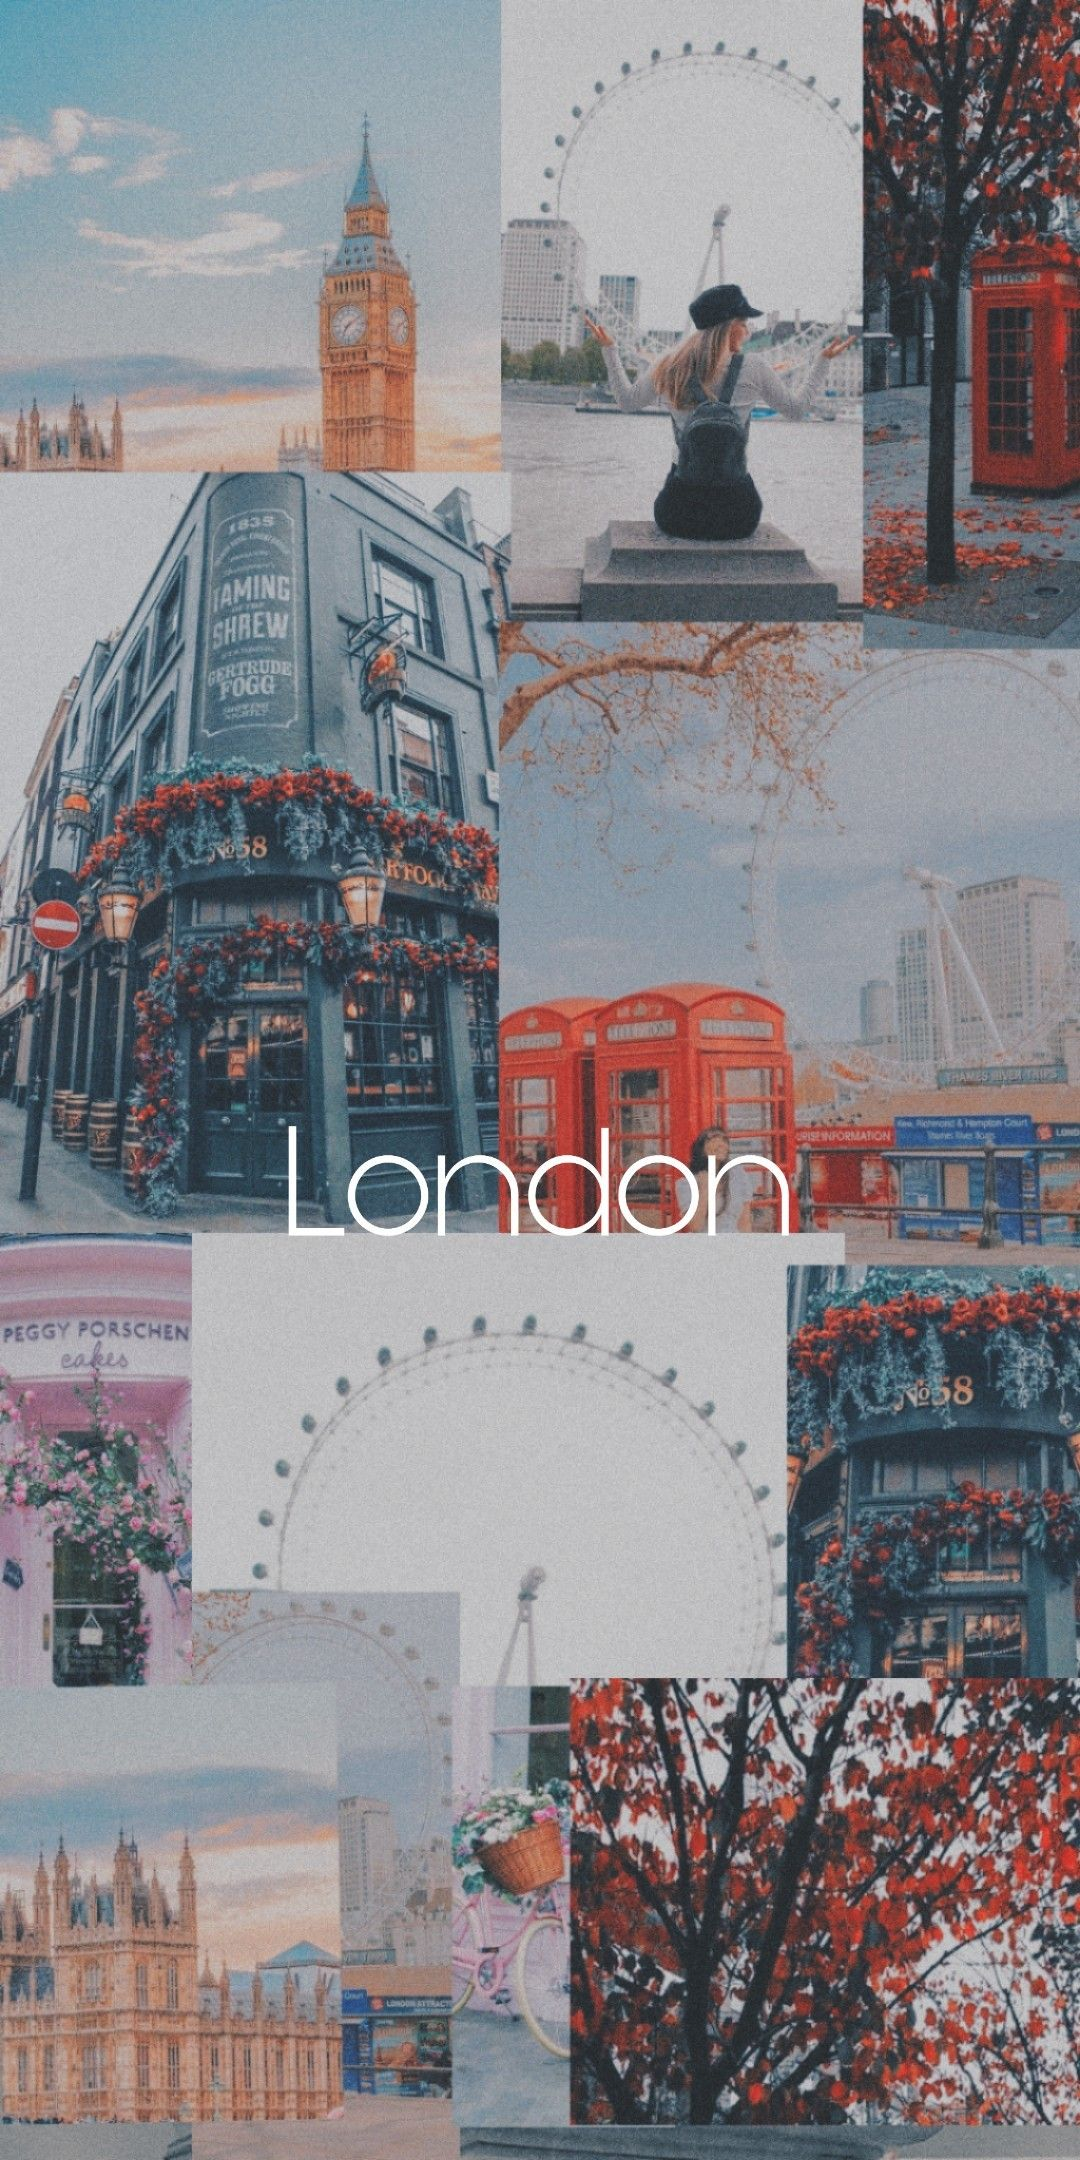 London's Finest London Wallpaper Aesthetic Desktop Wallpaper Aesthetic Backgrounds Aesthetic wallpaper city london